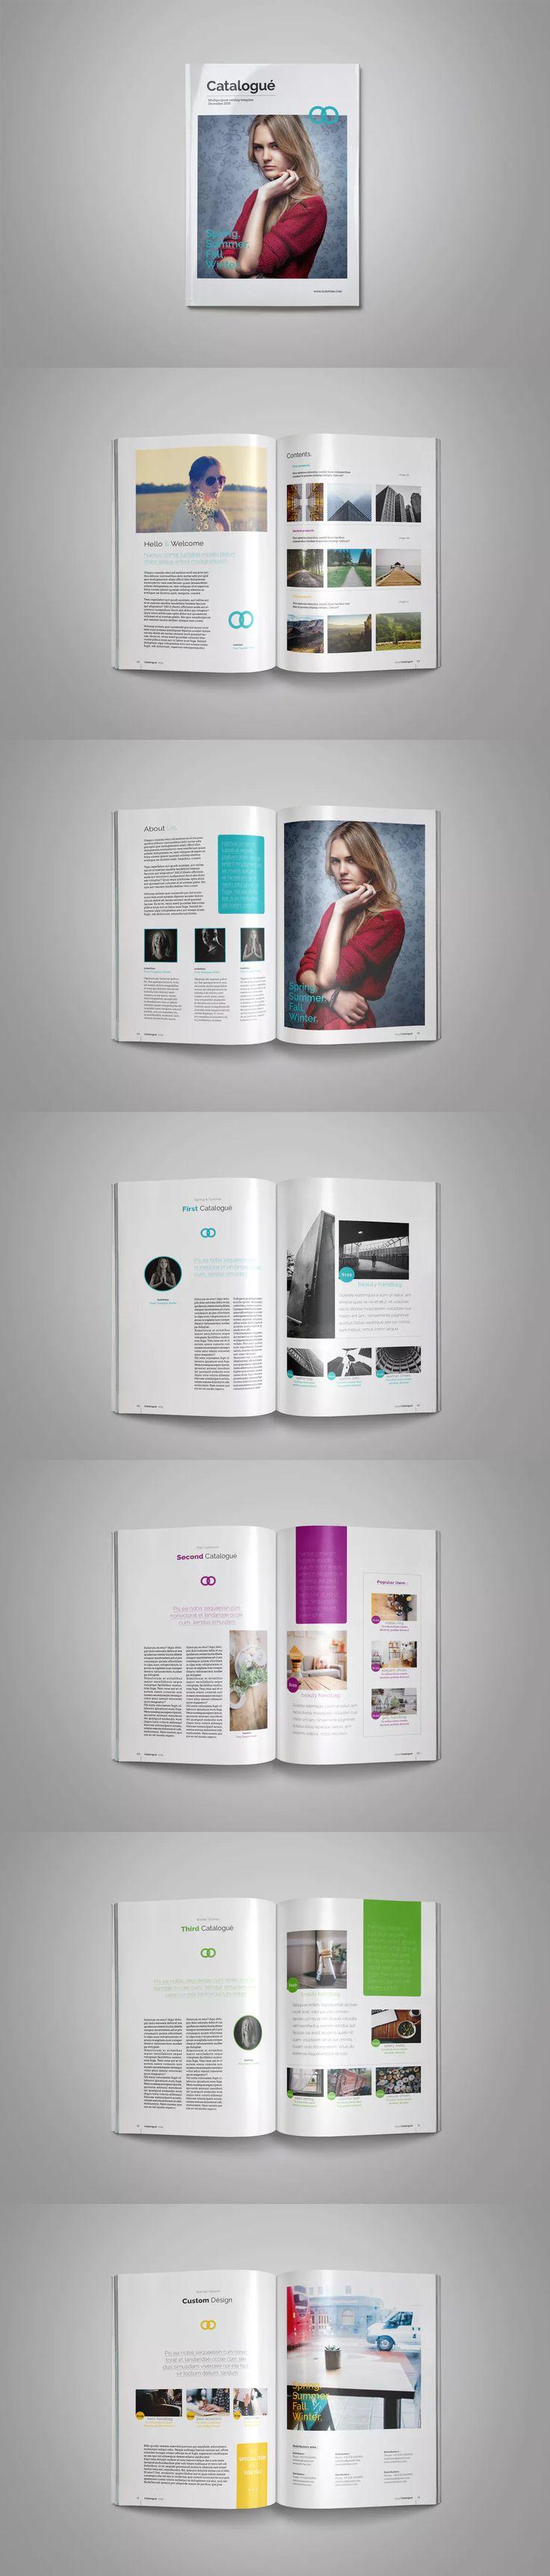 Multipurpose Brochure Catalog Template InDesign INDD